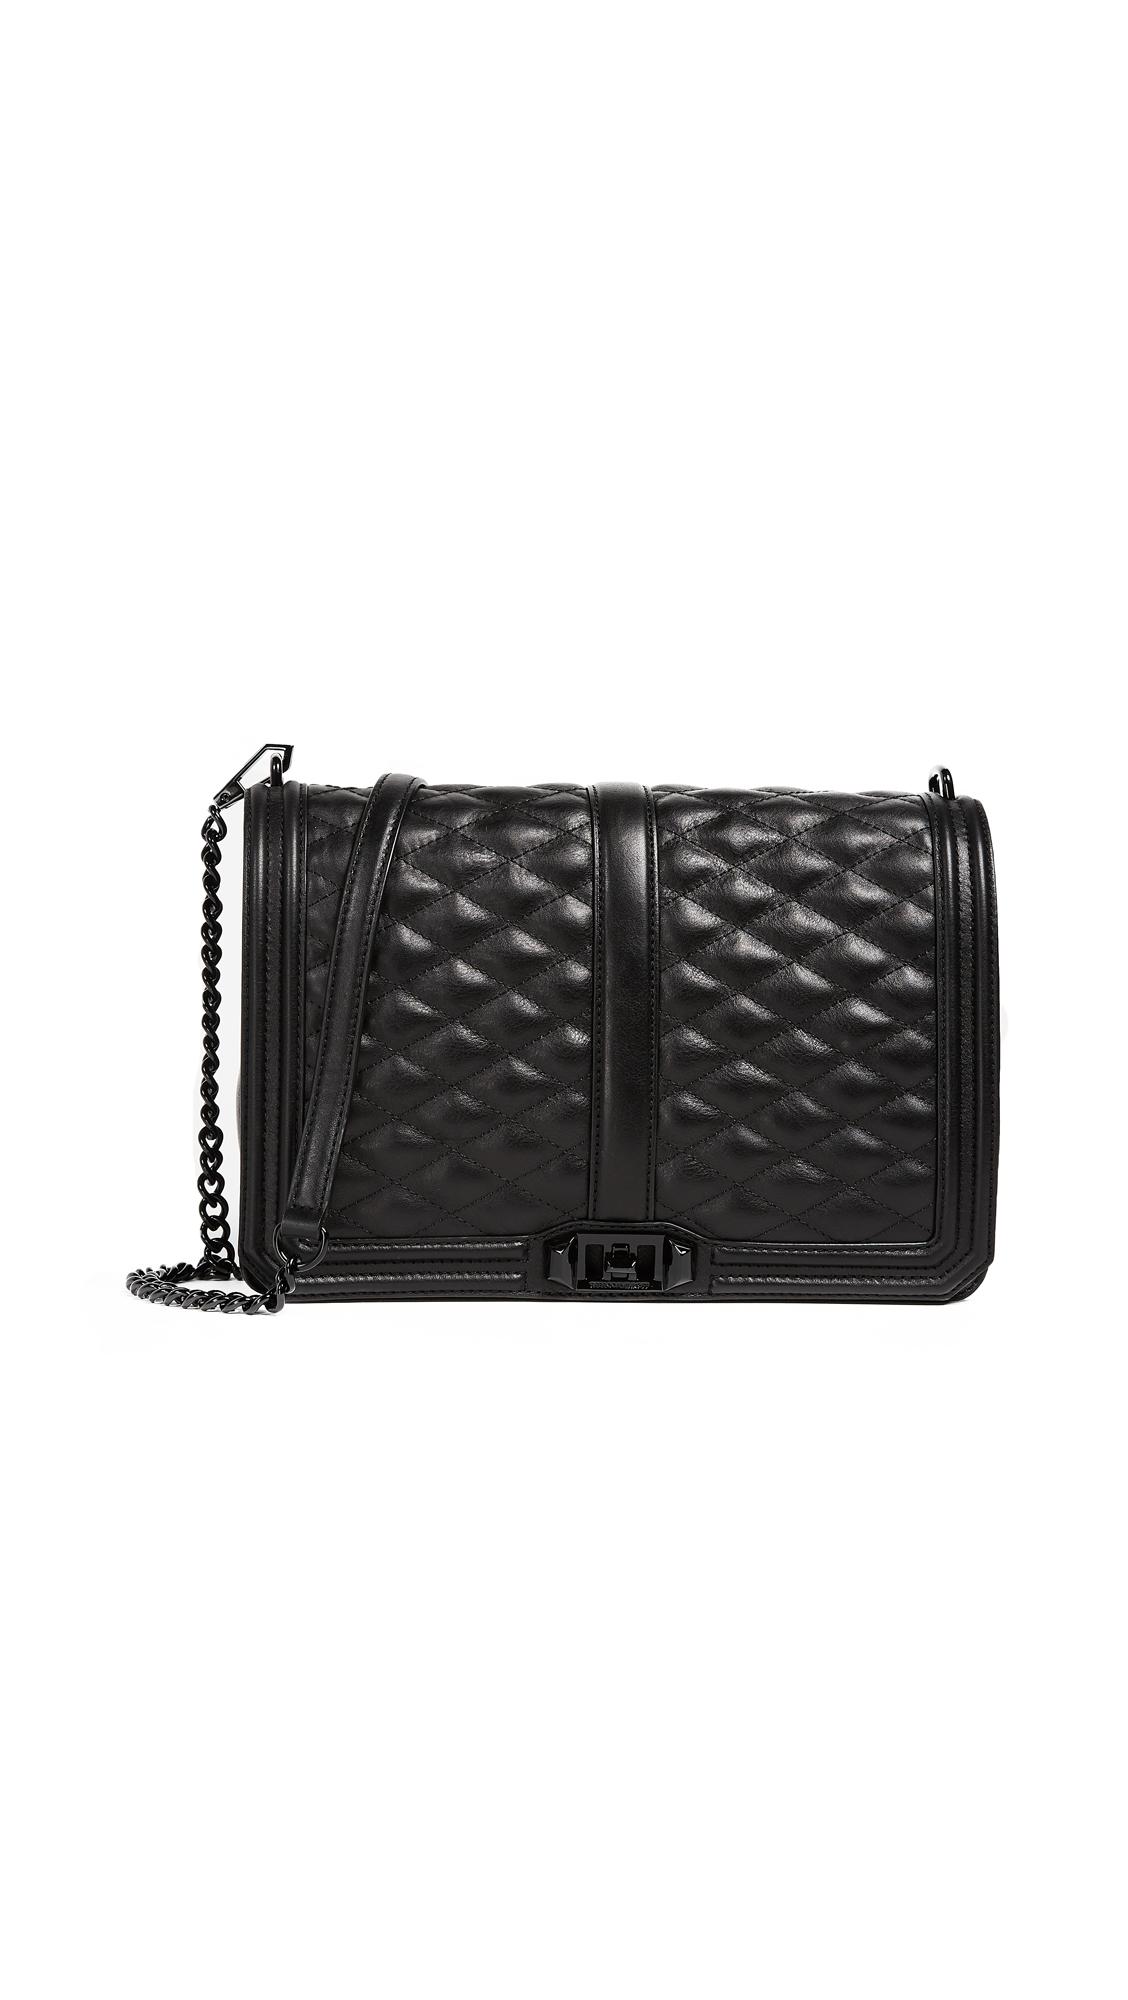 Rebecca Minkoff Jumbo Love Bag - Black